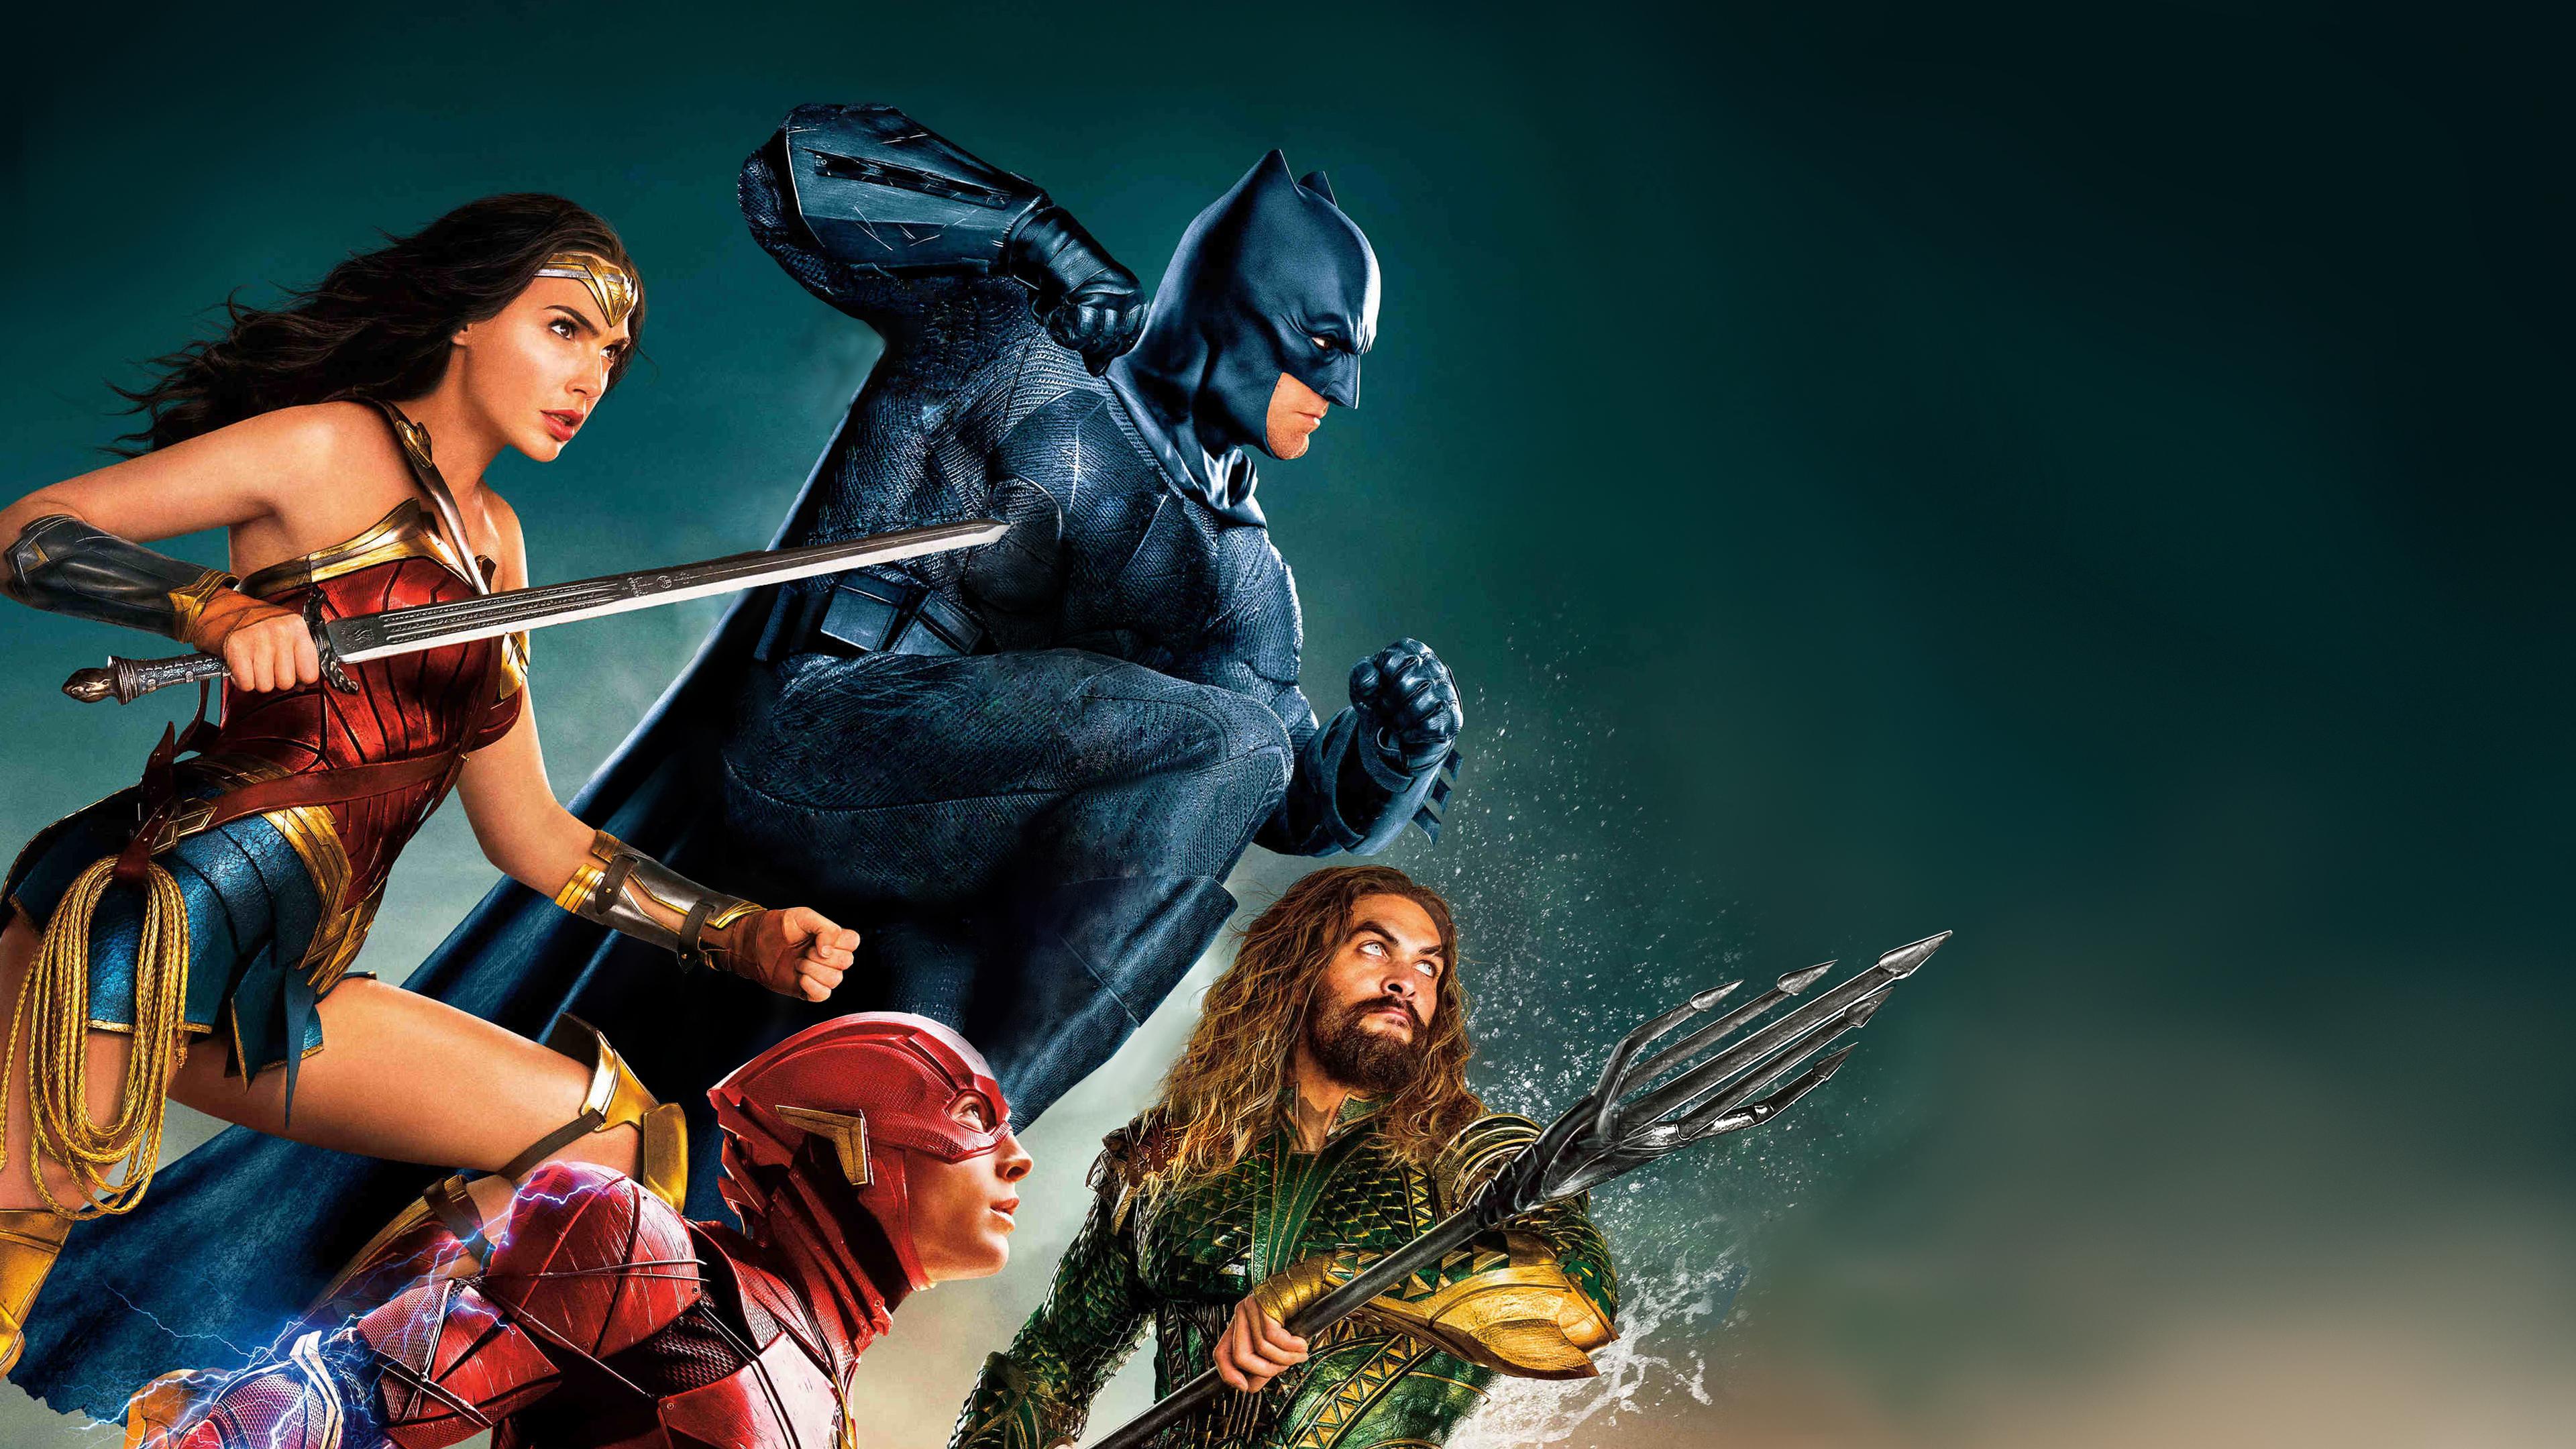 Justice League Hd Wallpaper Justice League Superheroes 4k Wallpapers Hd Wallpapers